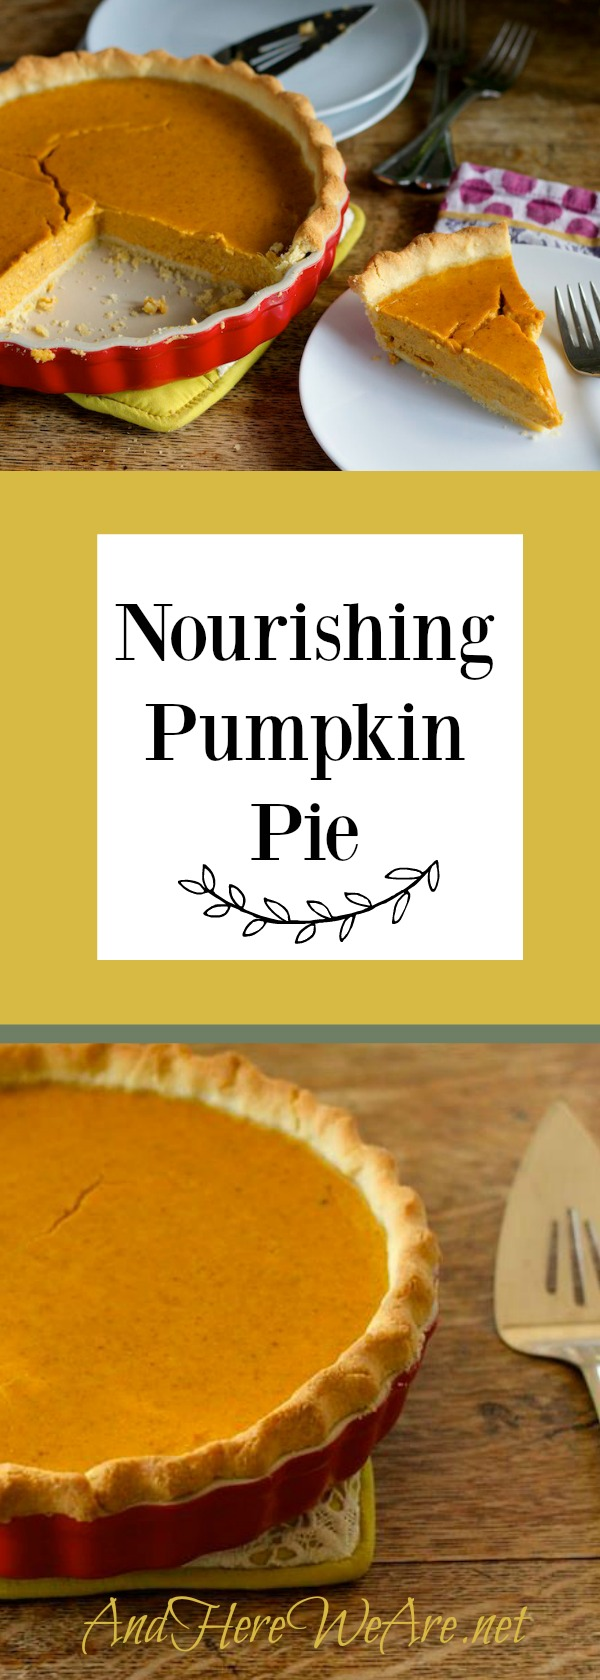 Nourishing Traditions Pumpkin Pie